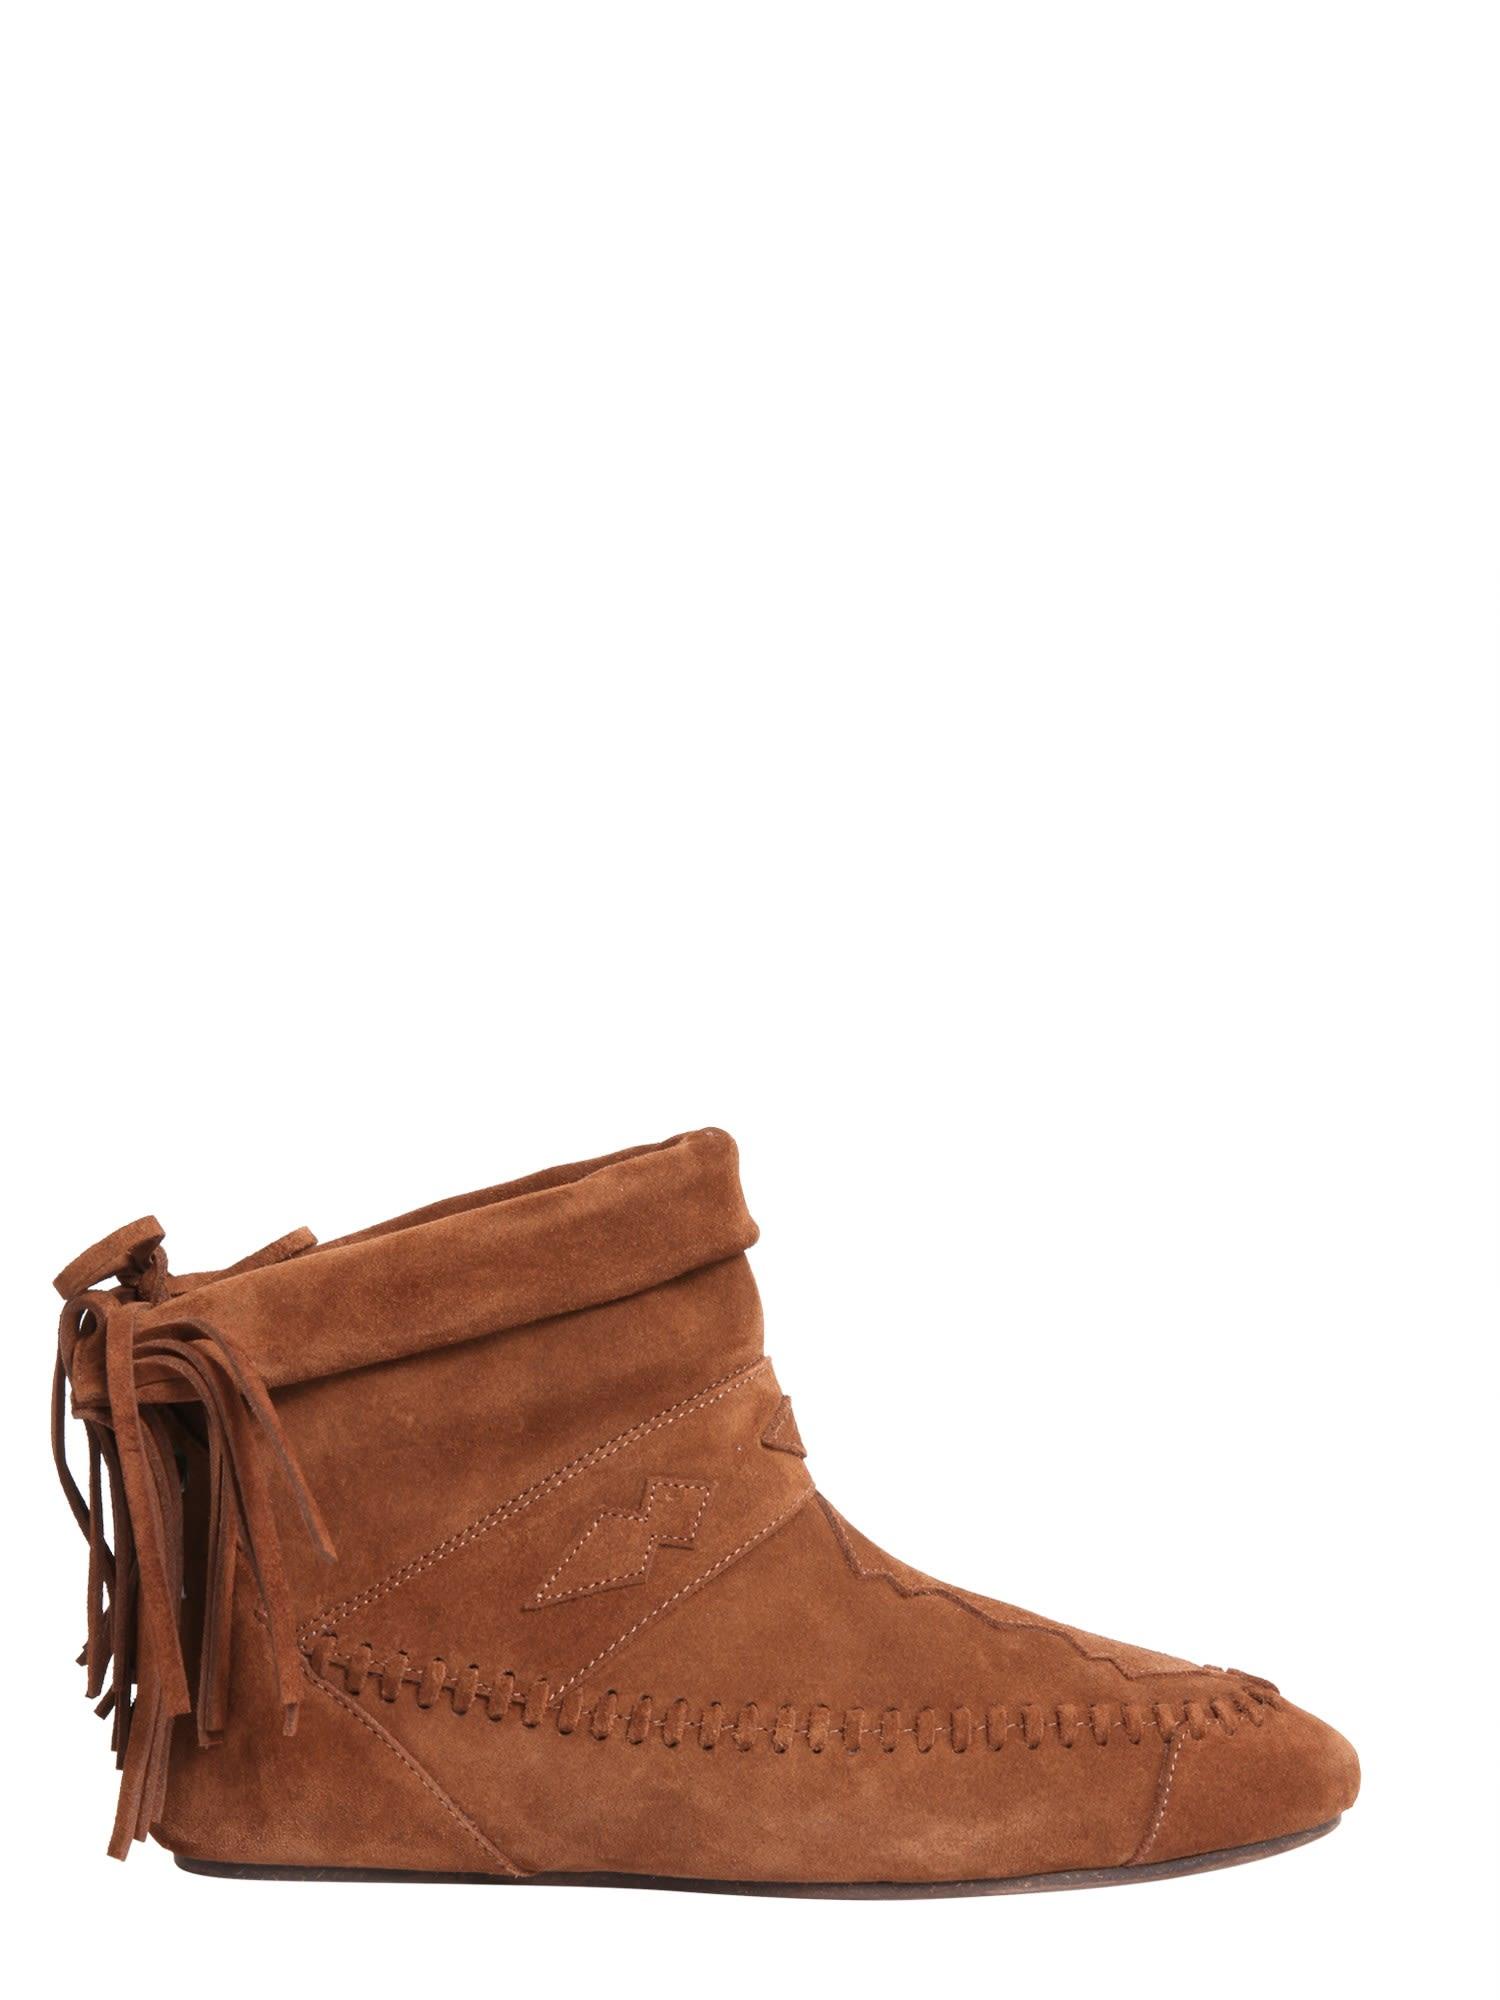 Saint Laurent Nino Fringed Boots